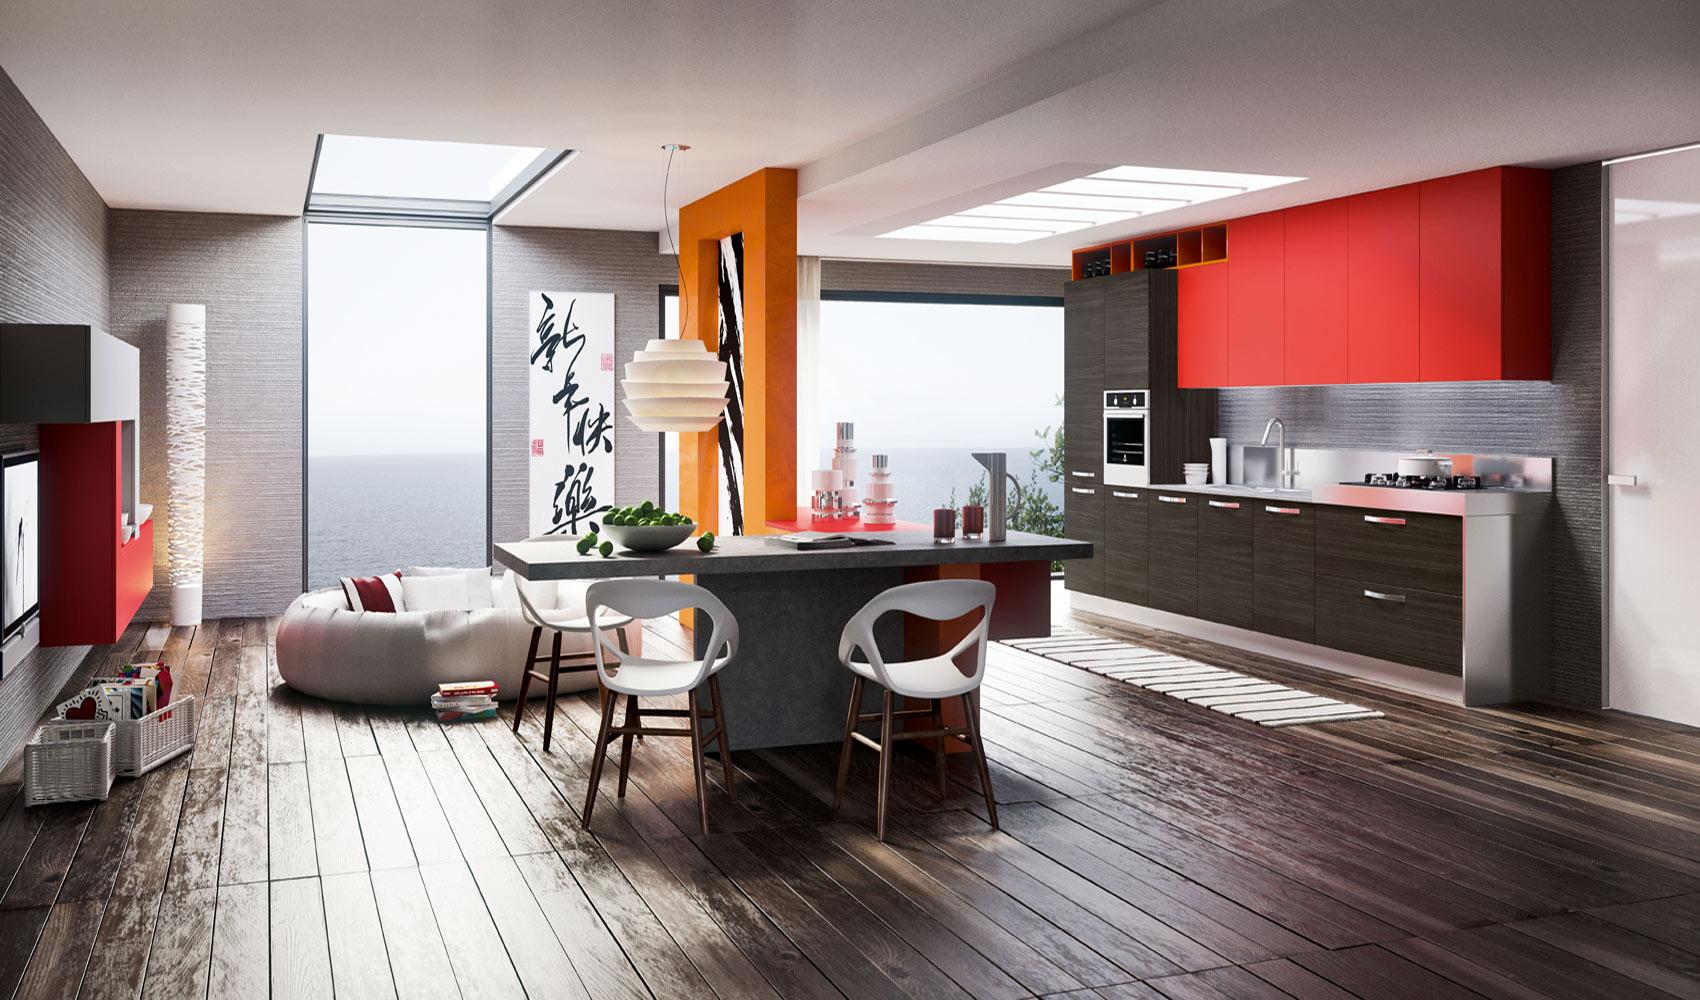 Dise o de cocinas modernas al estilo arte pop construye for Disenos de cocinas